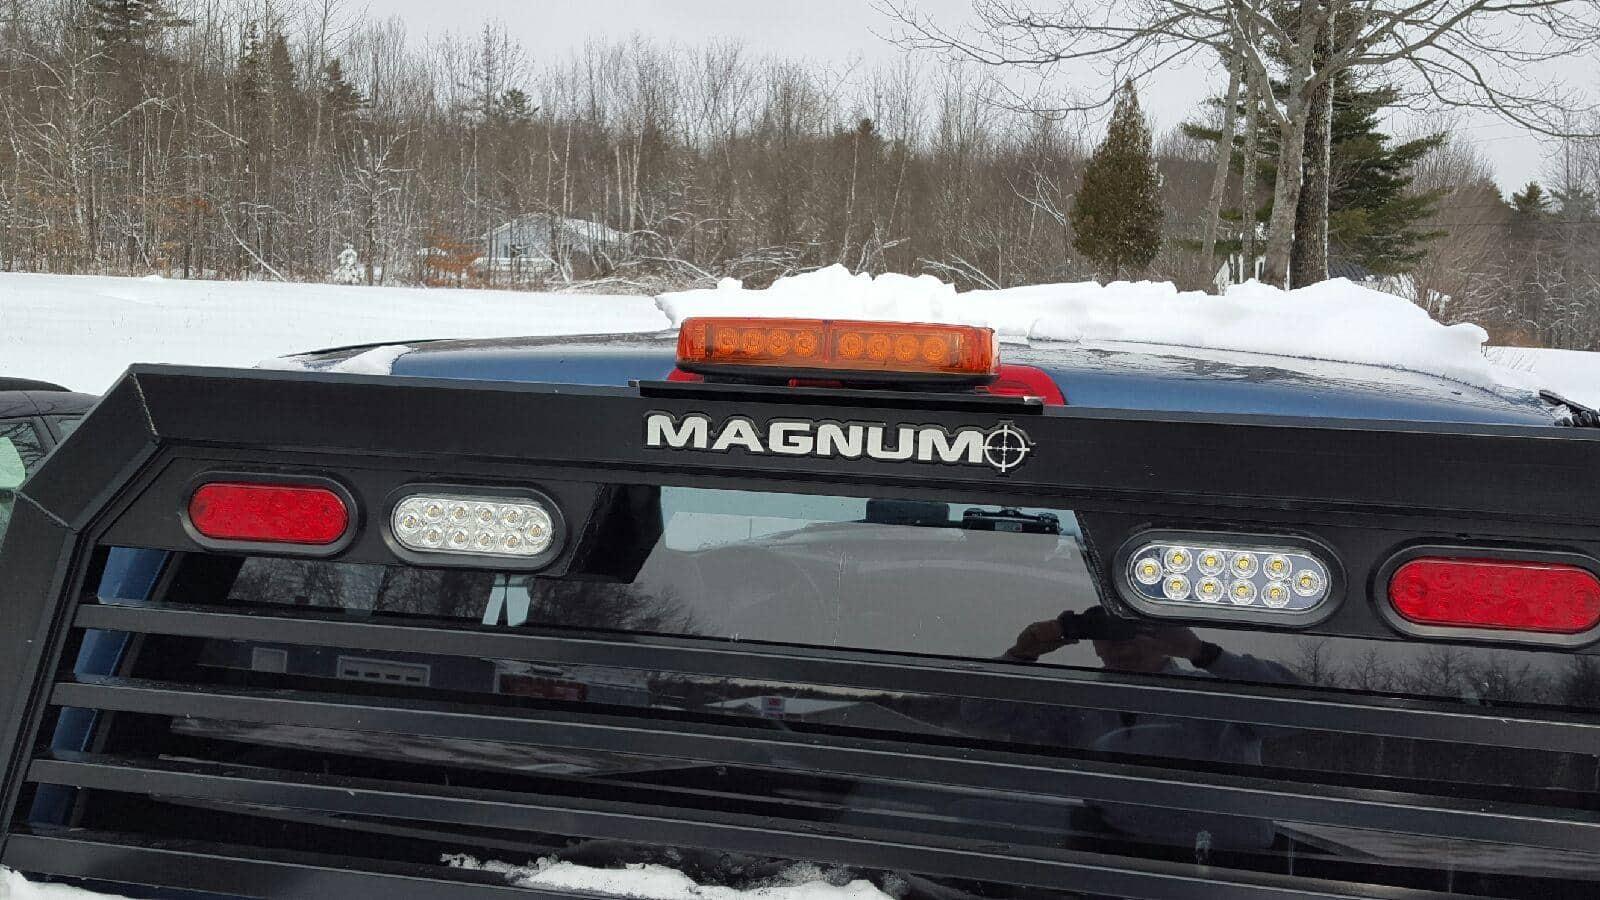 Magnum LED Light Bar